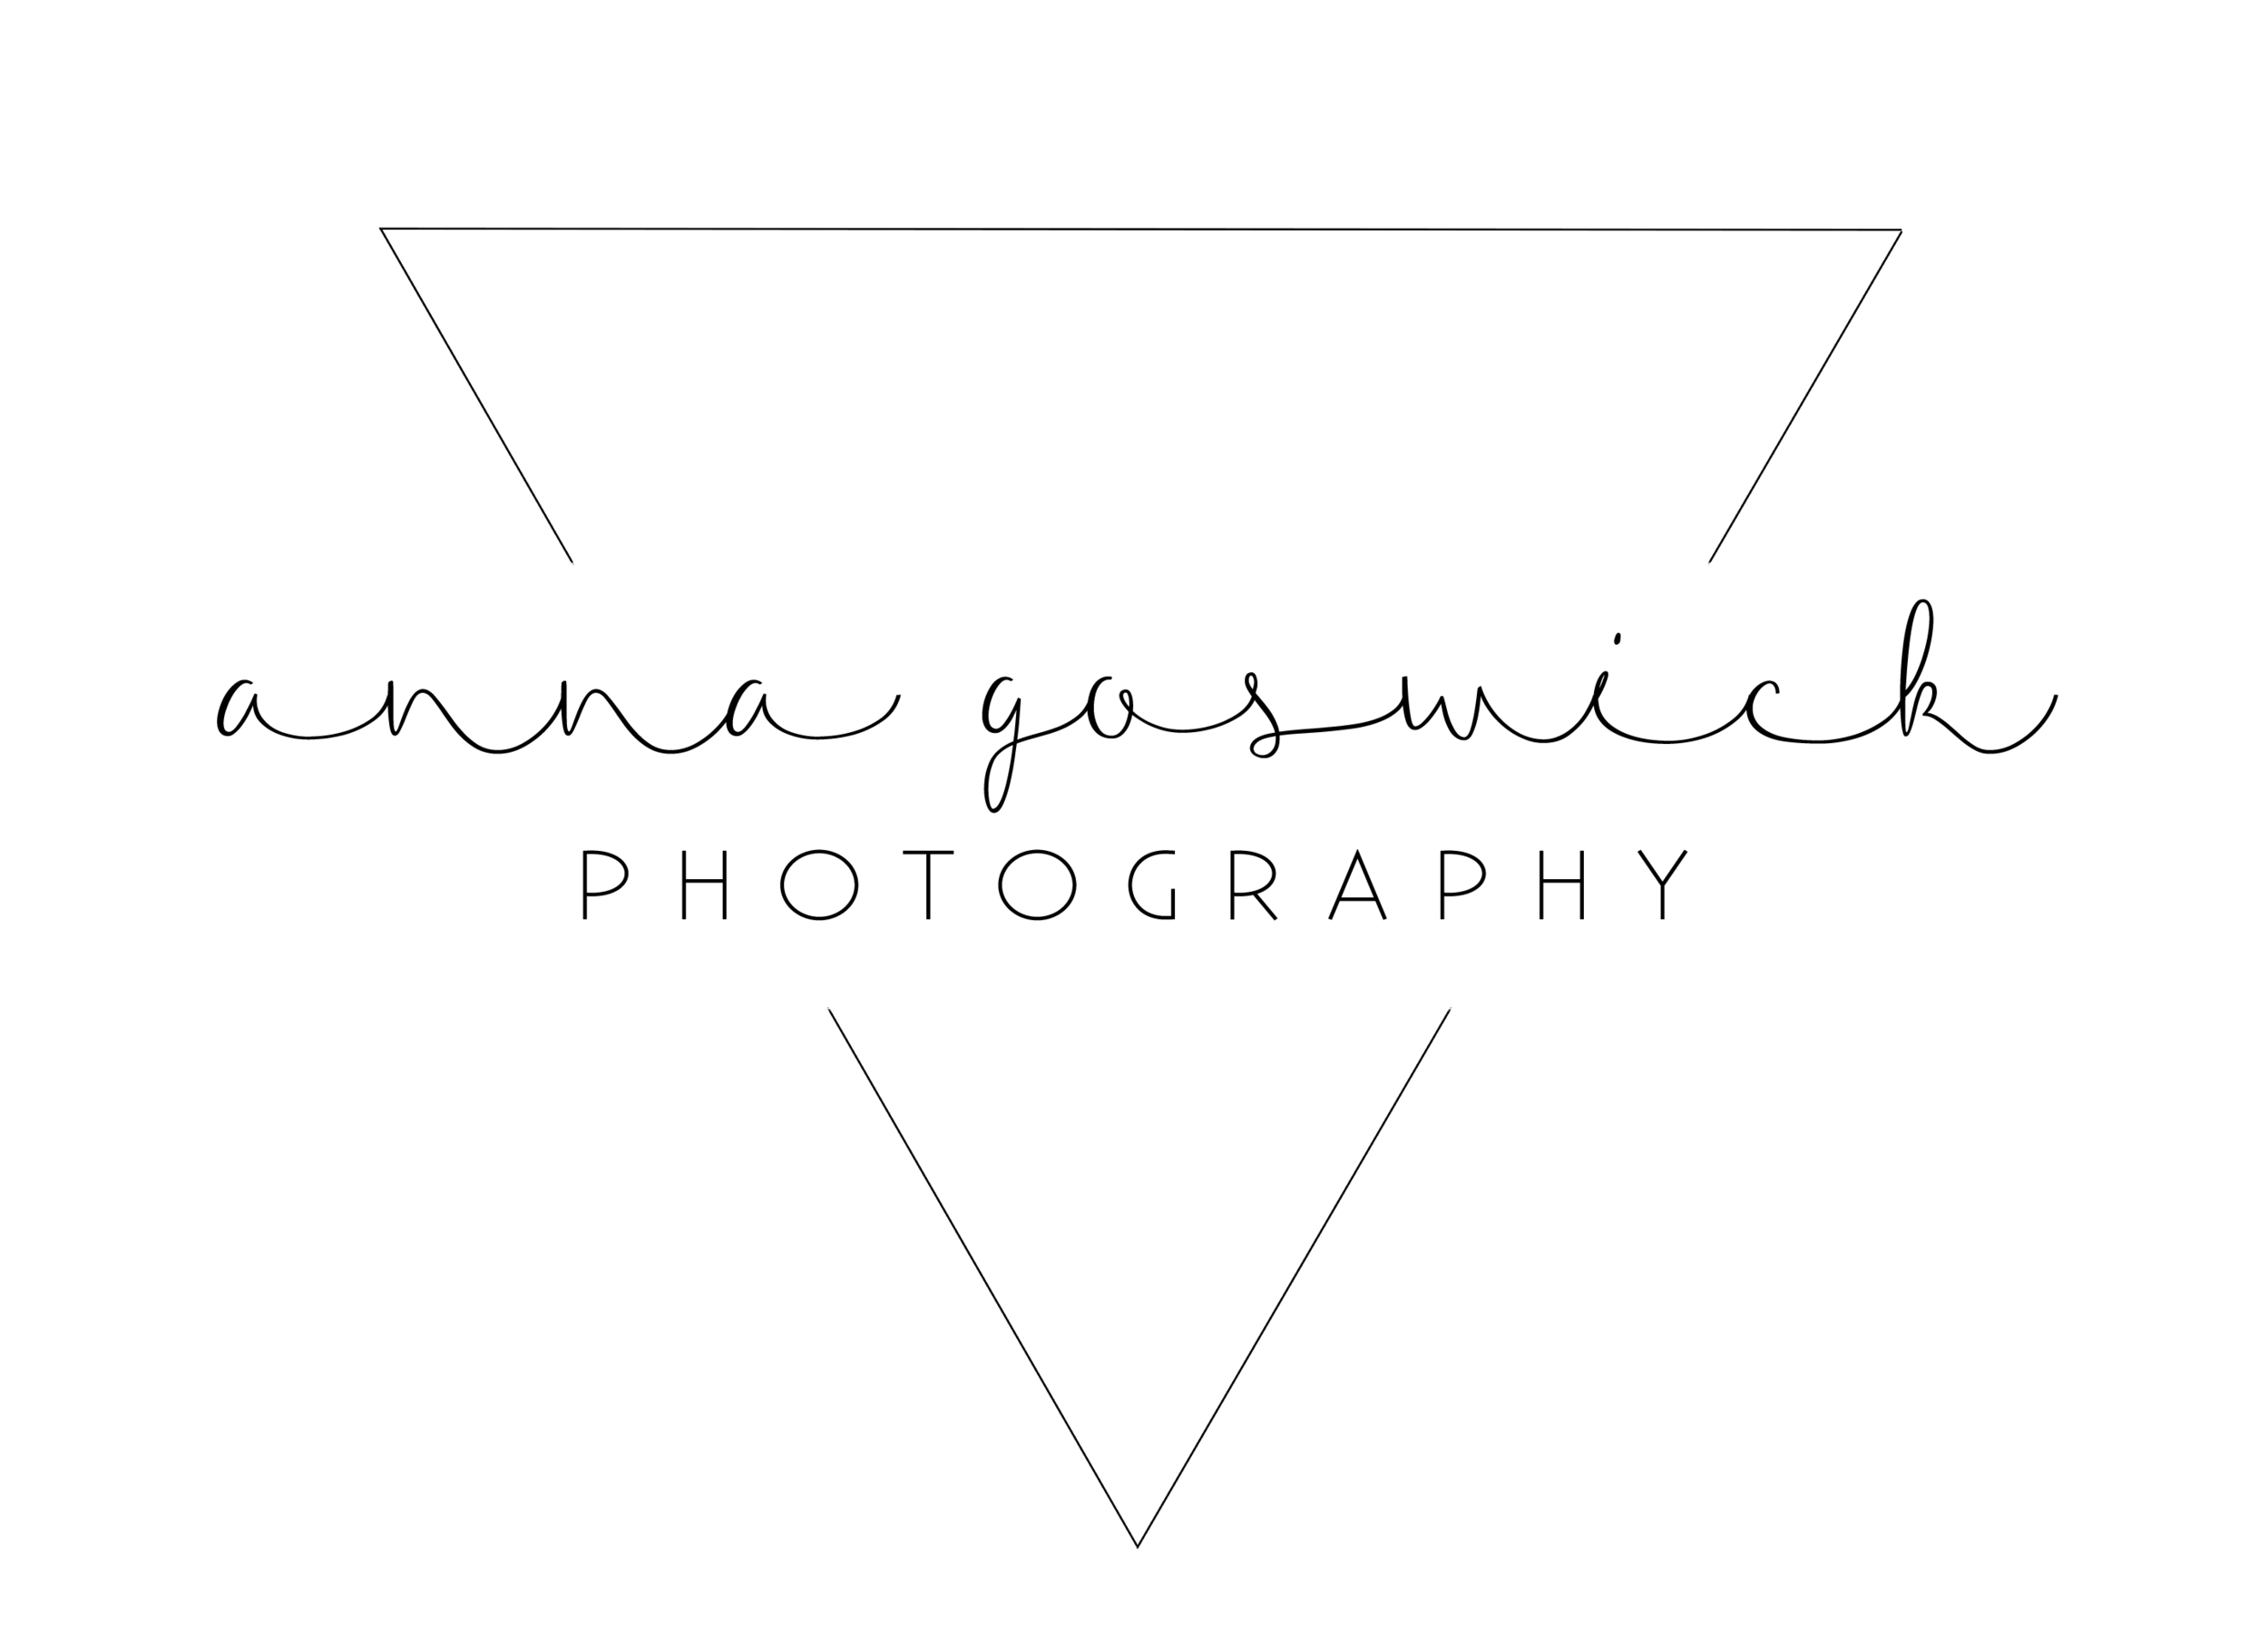 e878 - ANNA GOSWICK (1a) BLACK(1).png